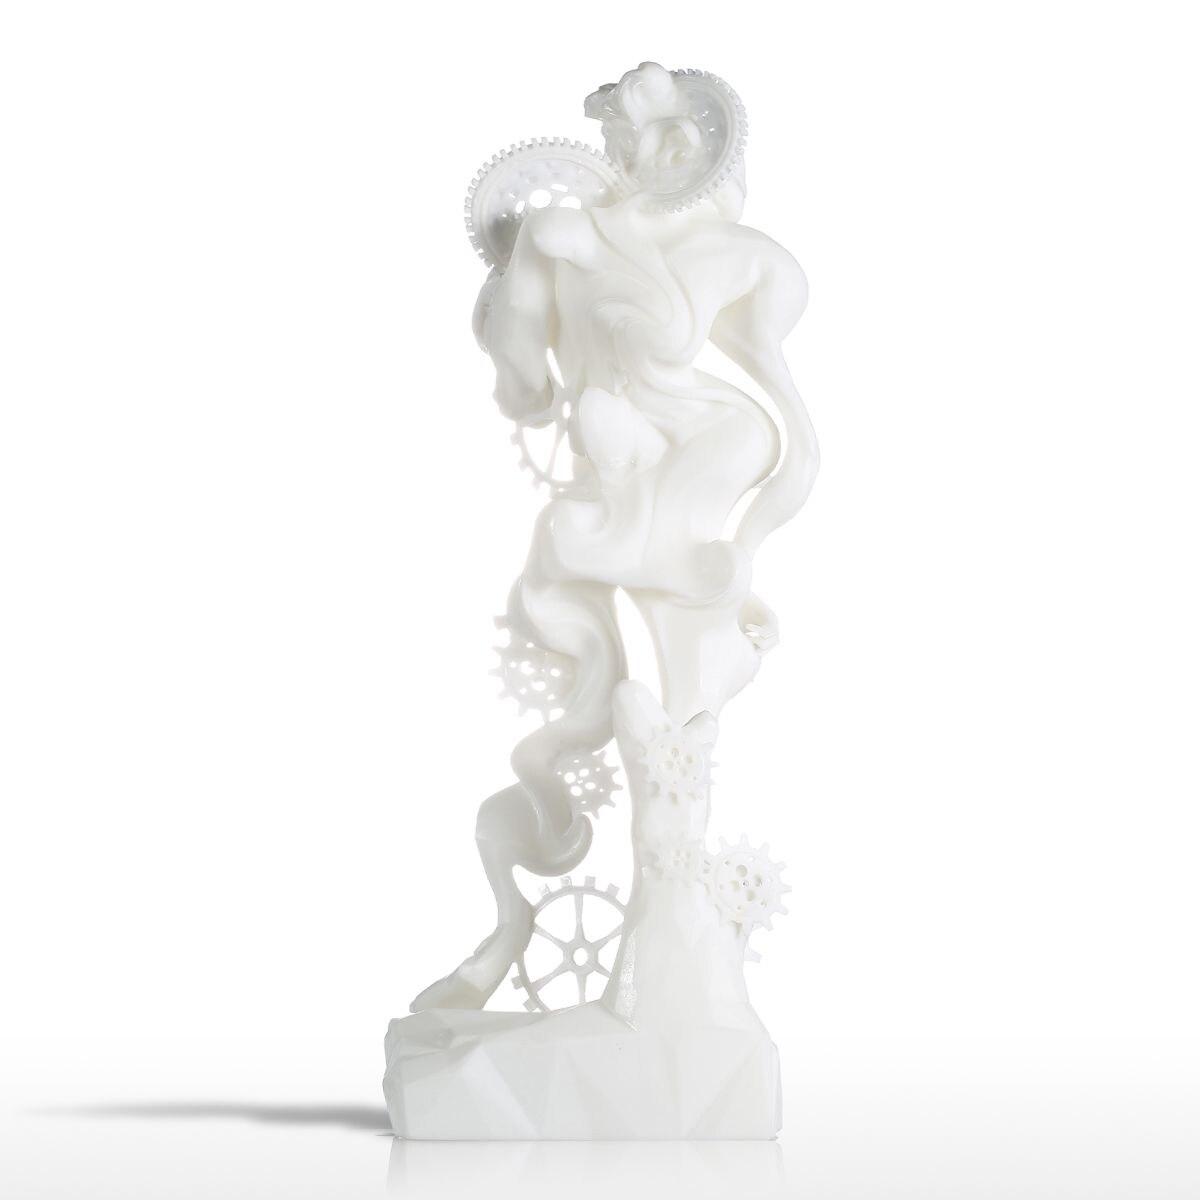 US $112 27 46% OFF Tooarts Escultura Surrealism David 3D Printed Modern  Sculpture Statues for Home Room Decoration Statues &Sculptures-in Statues &